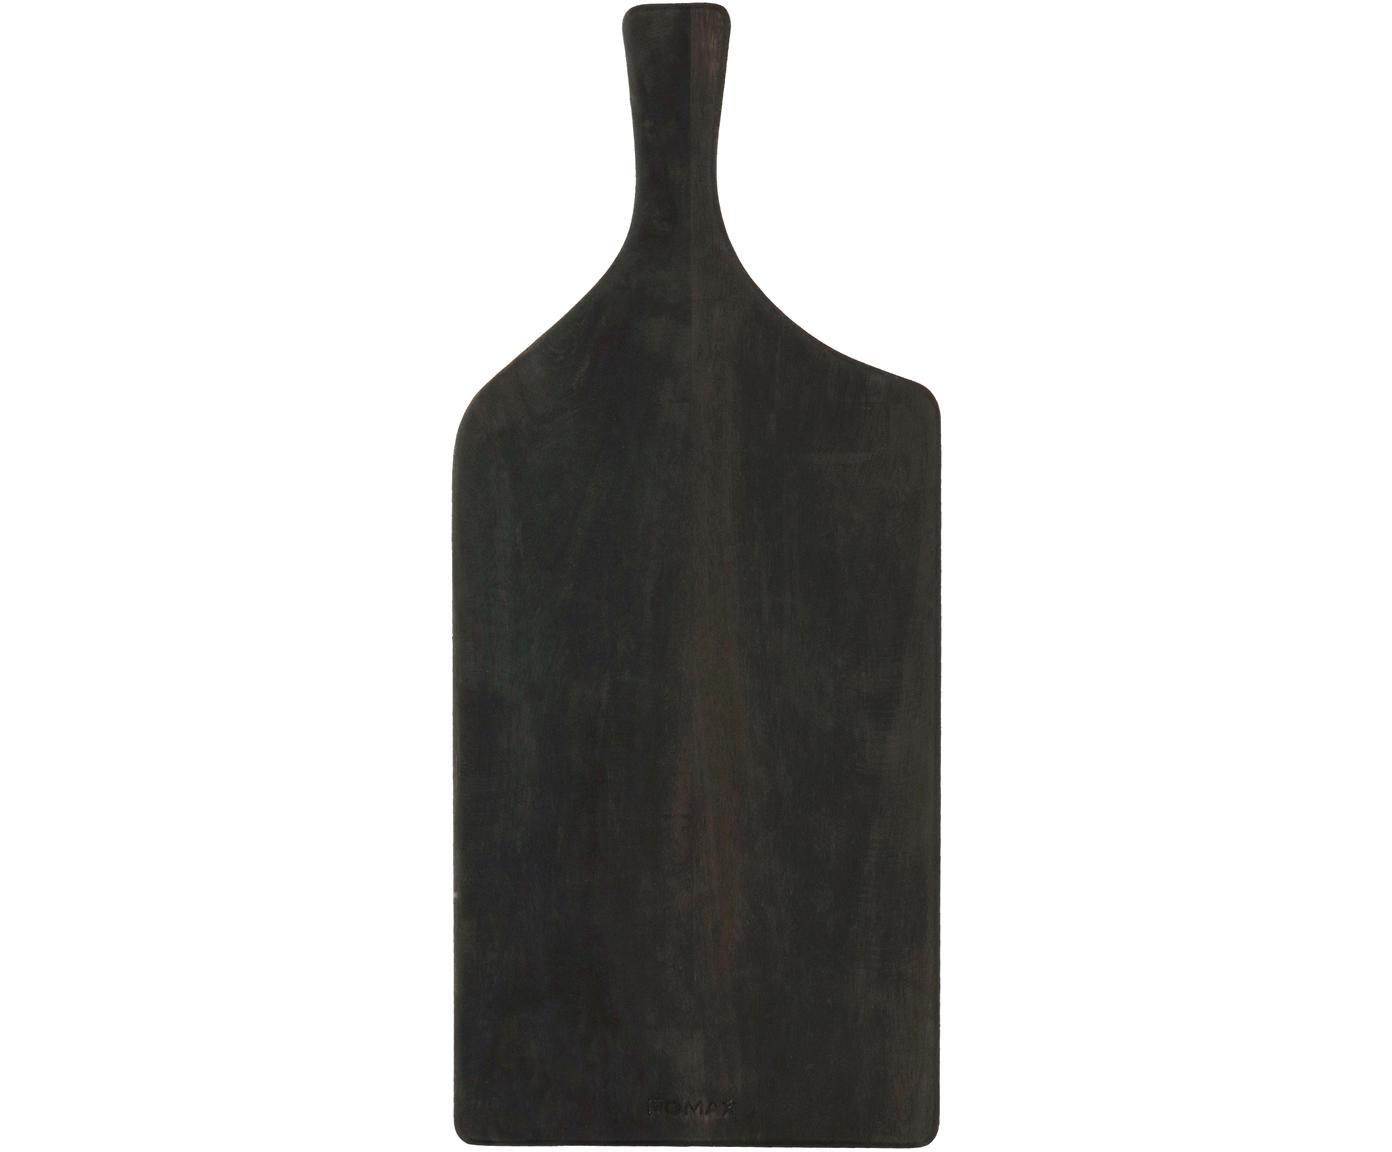 Snijplank Limitless, Mangohout, Mangohoutkleurig, 50 x 22 cm